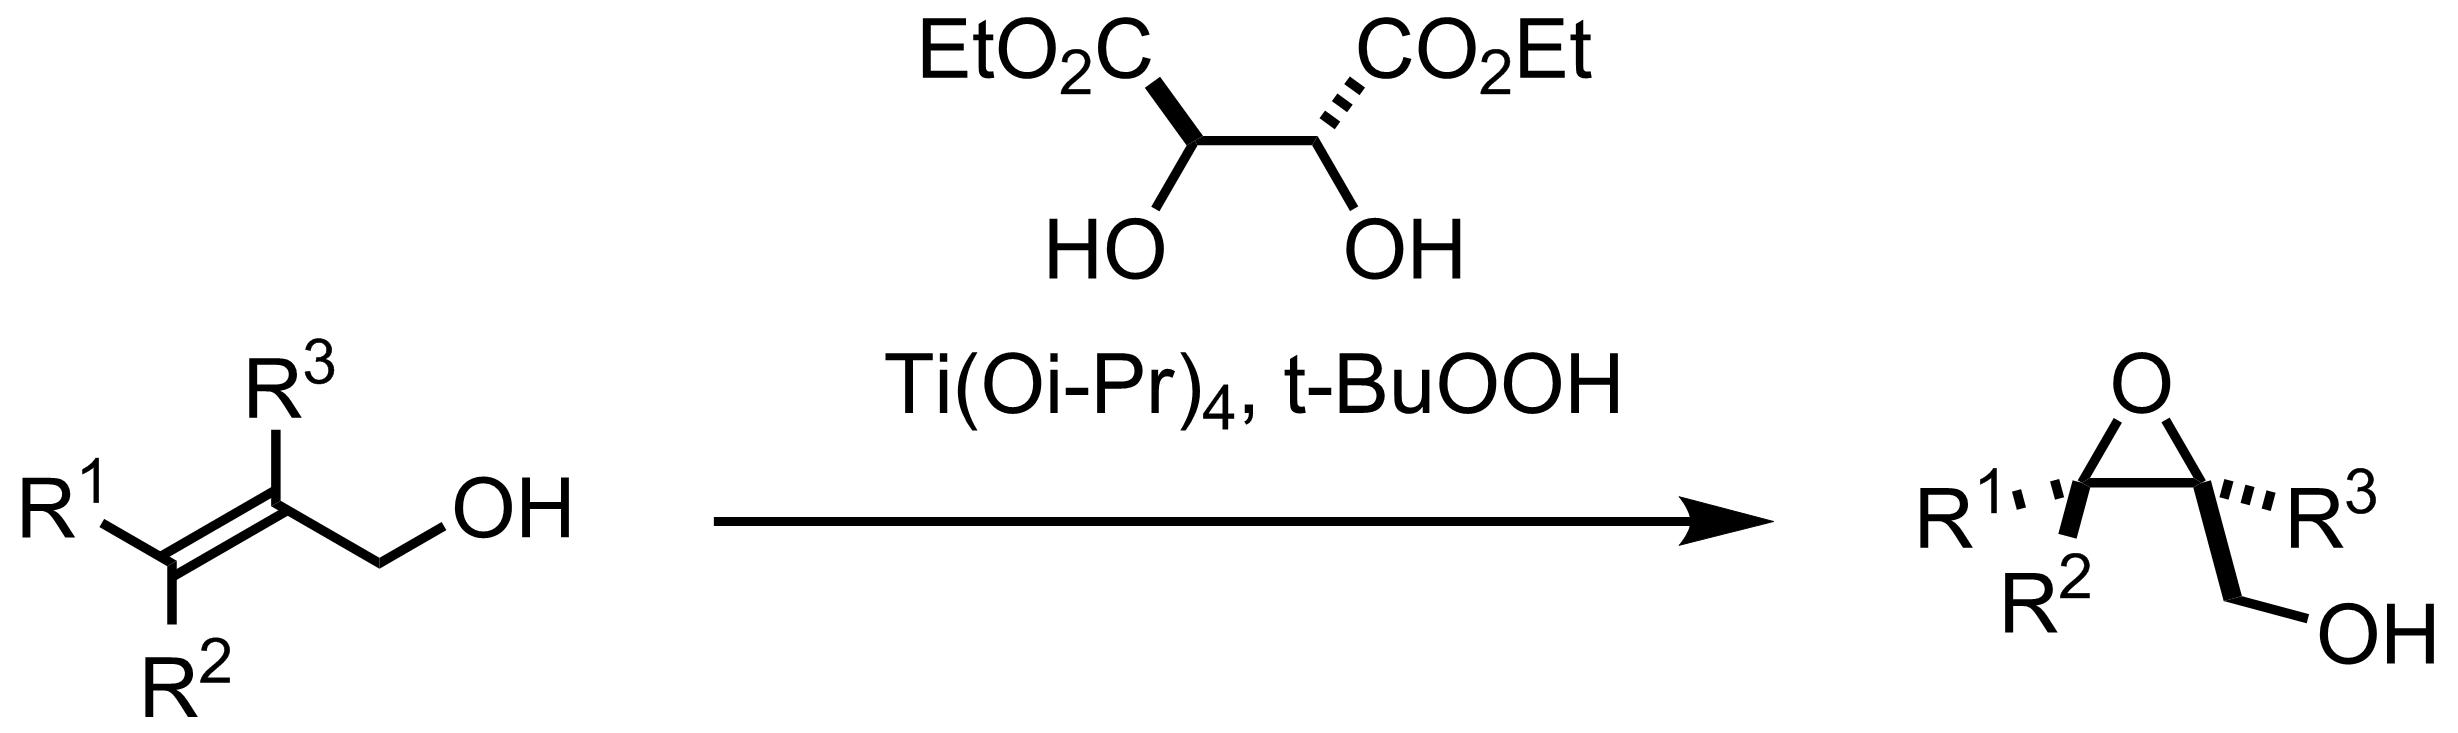 Schematic representation of the Sharpless Epoxidation.